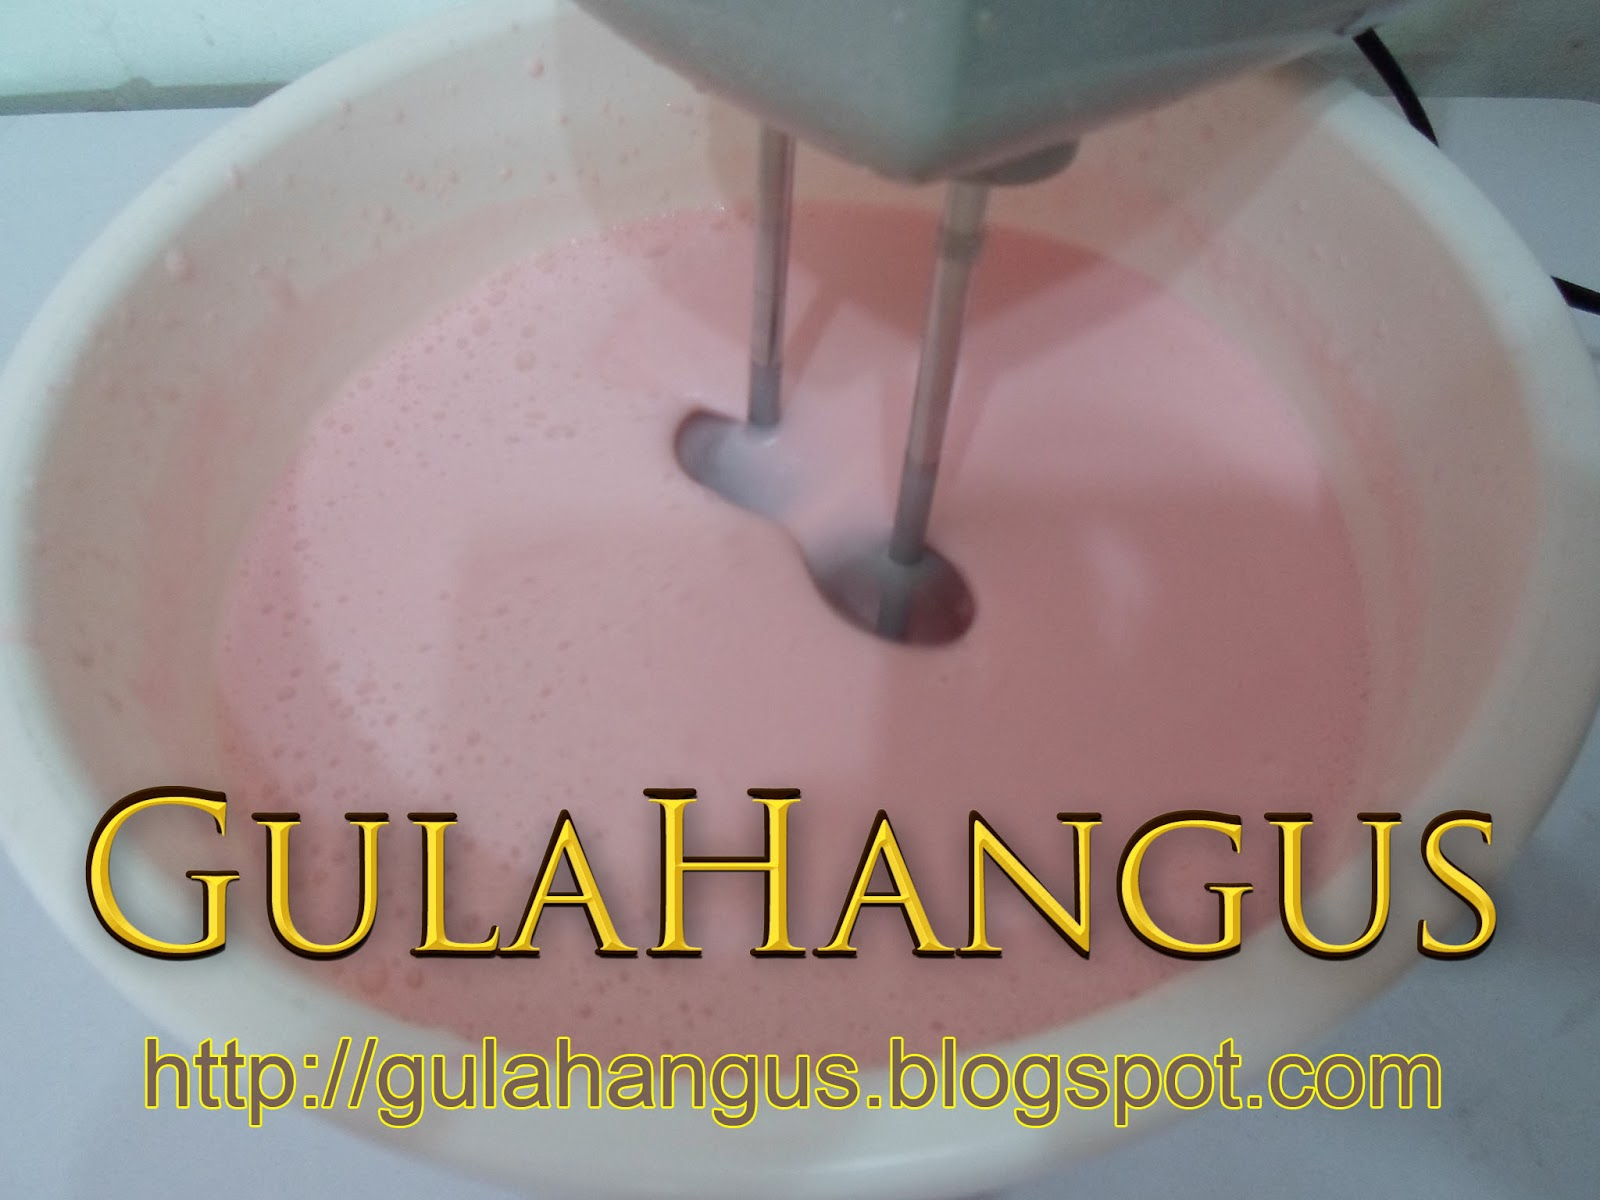 +vanilla+coklat+Puding+susu+coklat+strawberry+UHT+APAM+coklat+PUDING ...